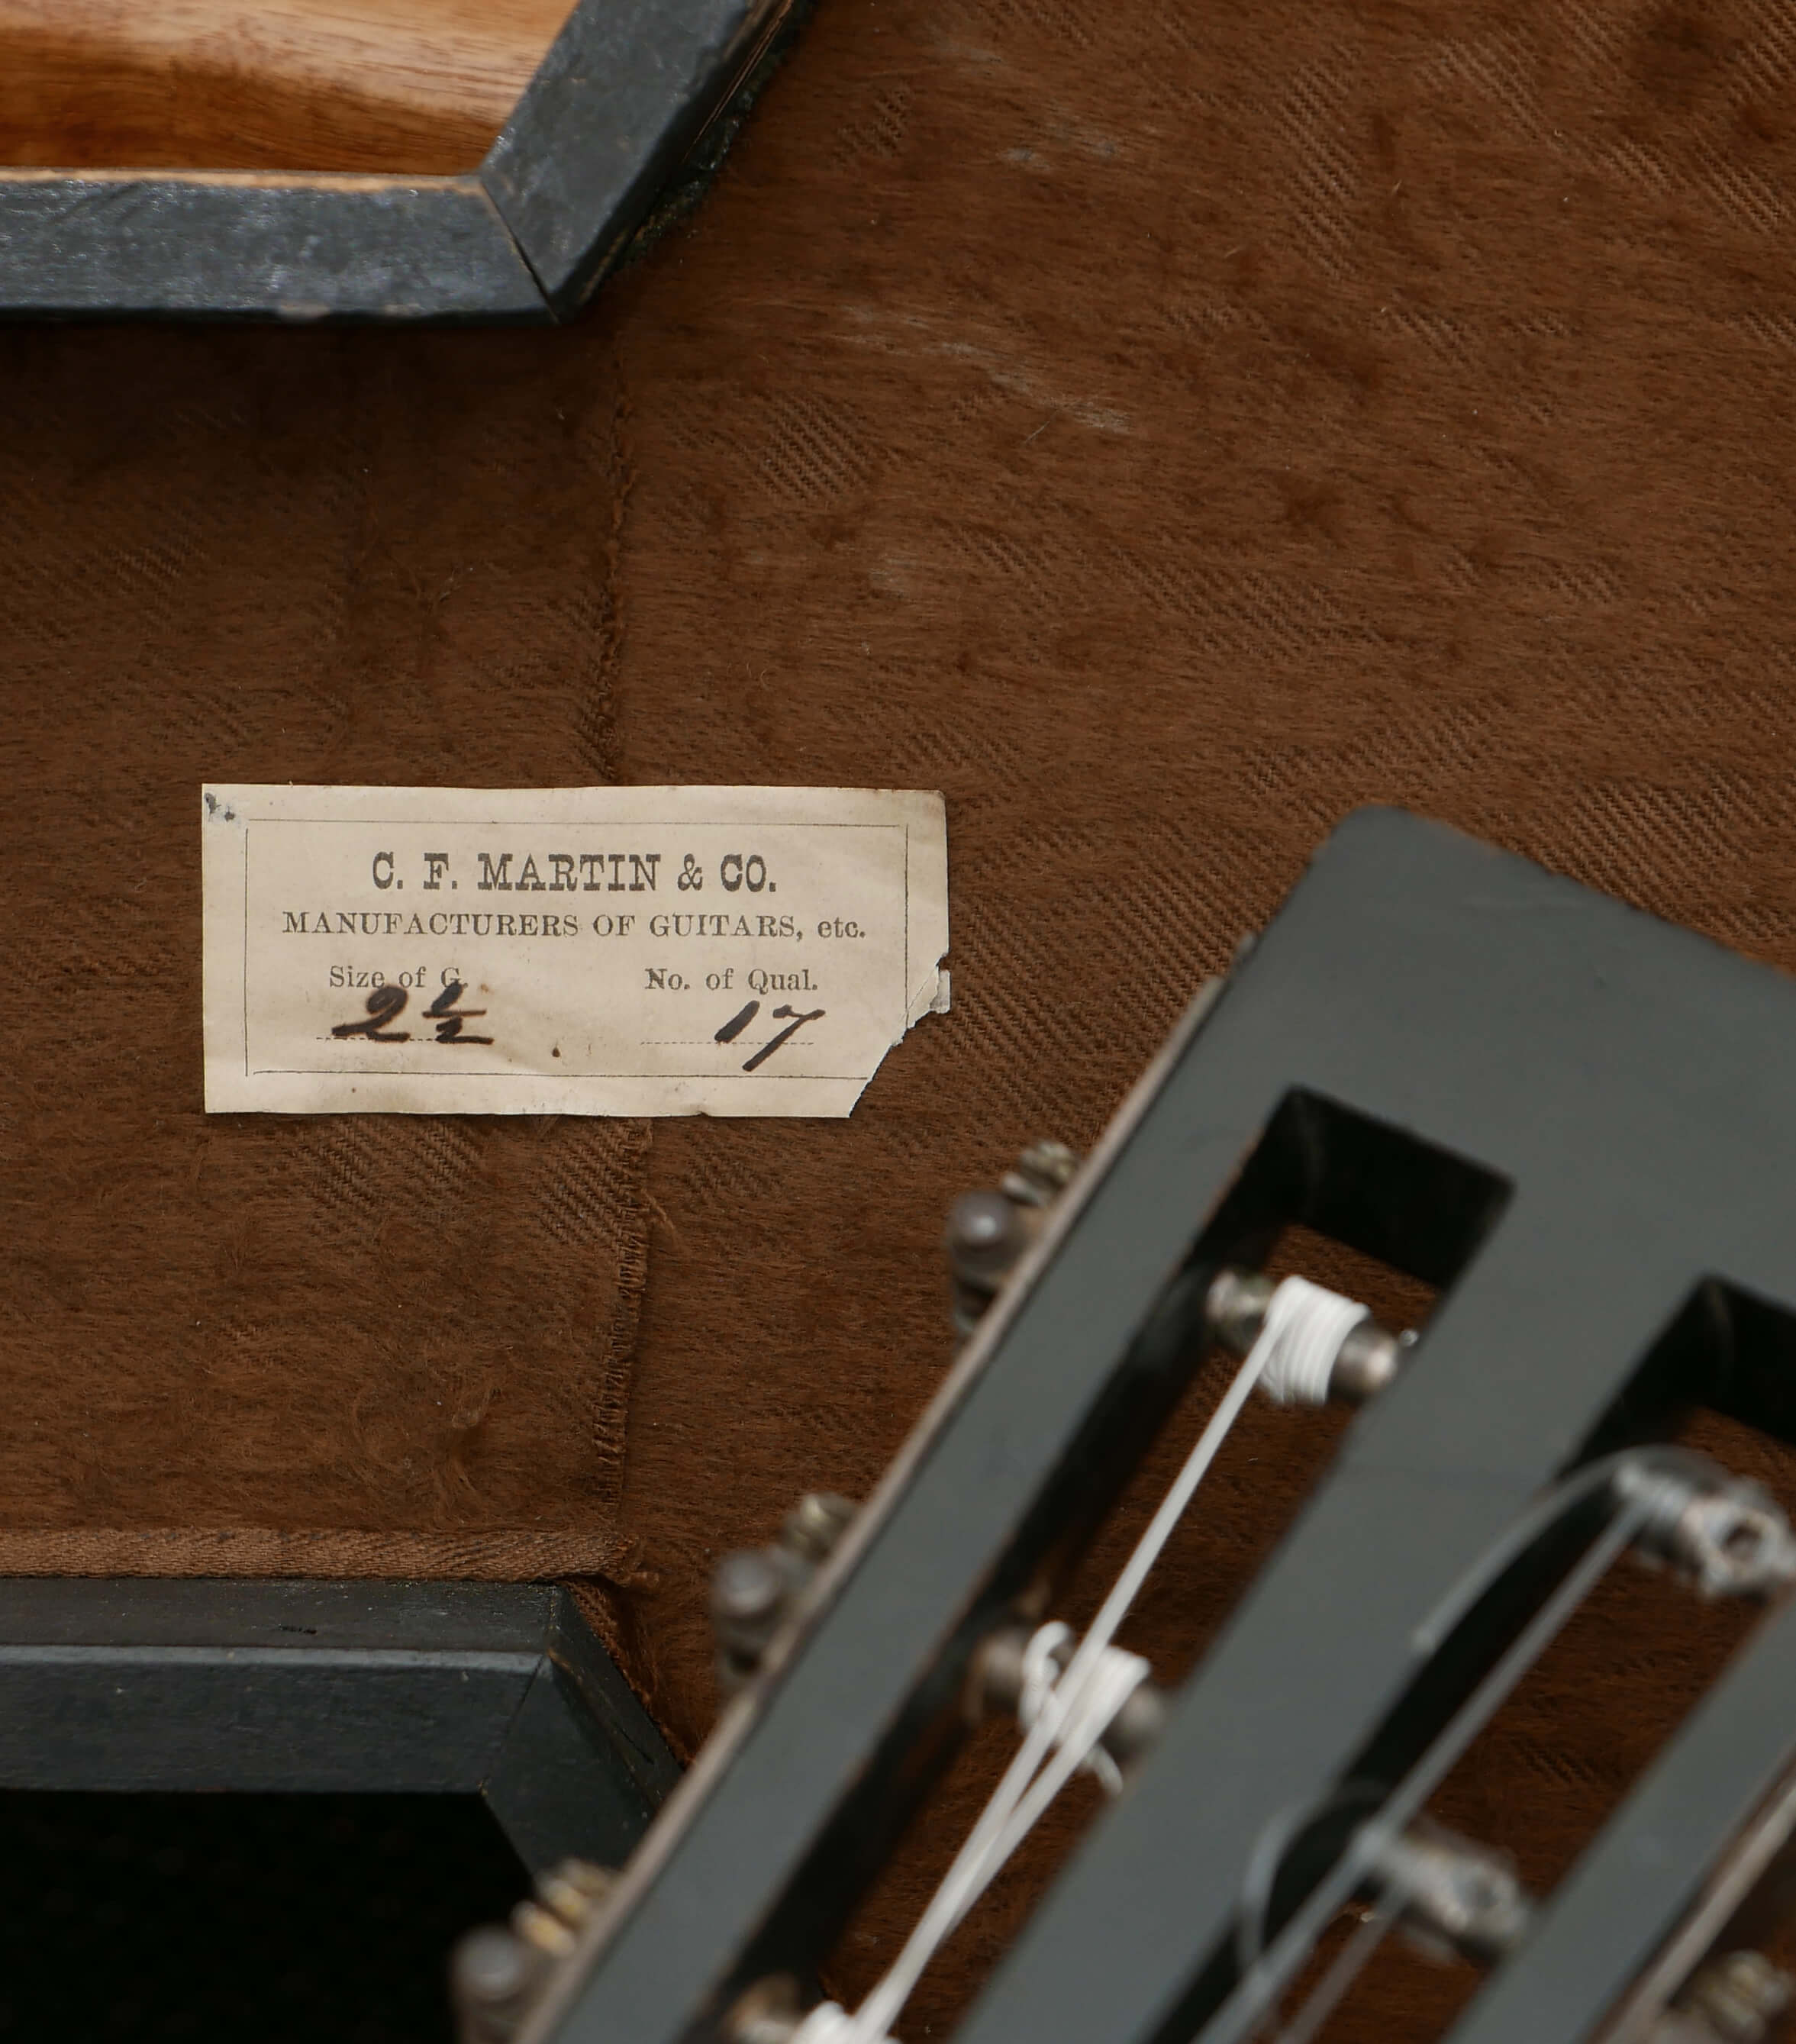 1869 Martin 2 1/2-17 Guitar, Brazilian Rosewood - Vintage